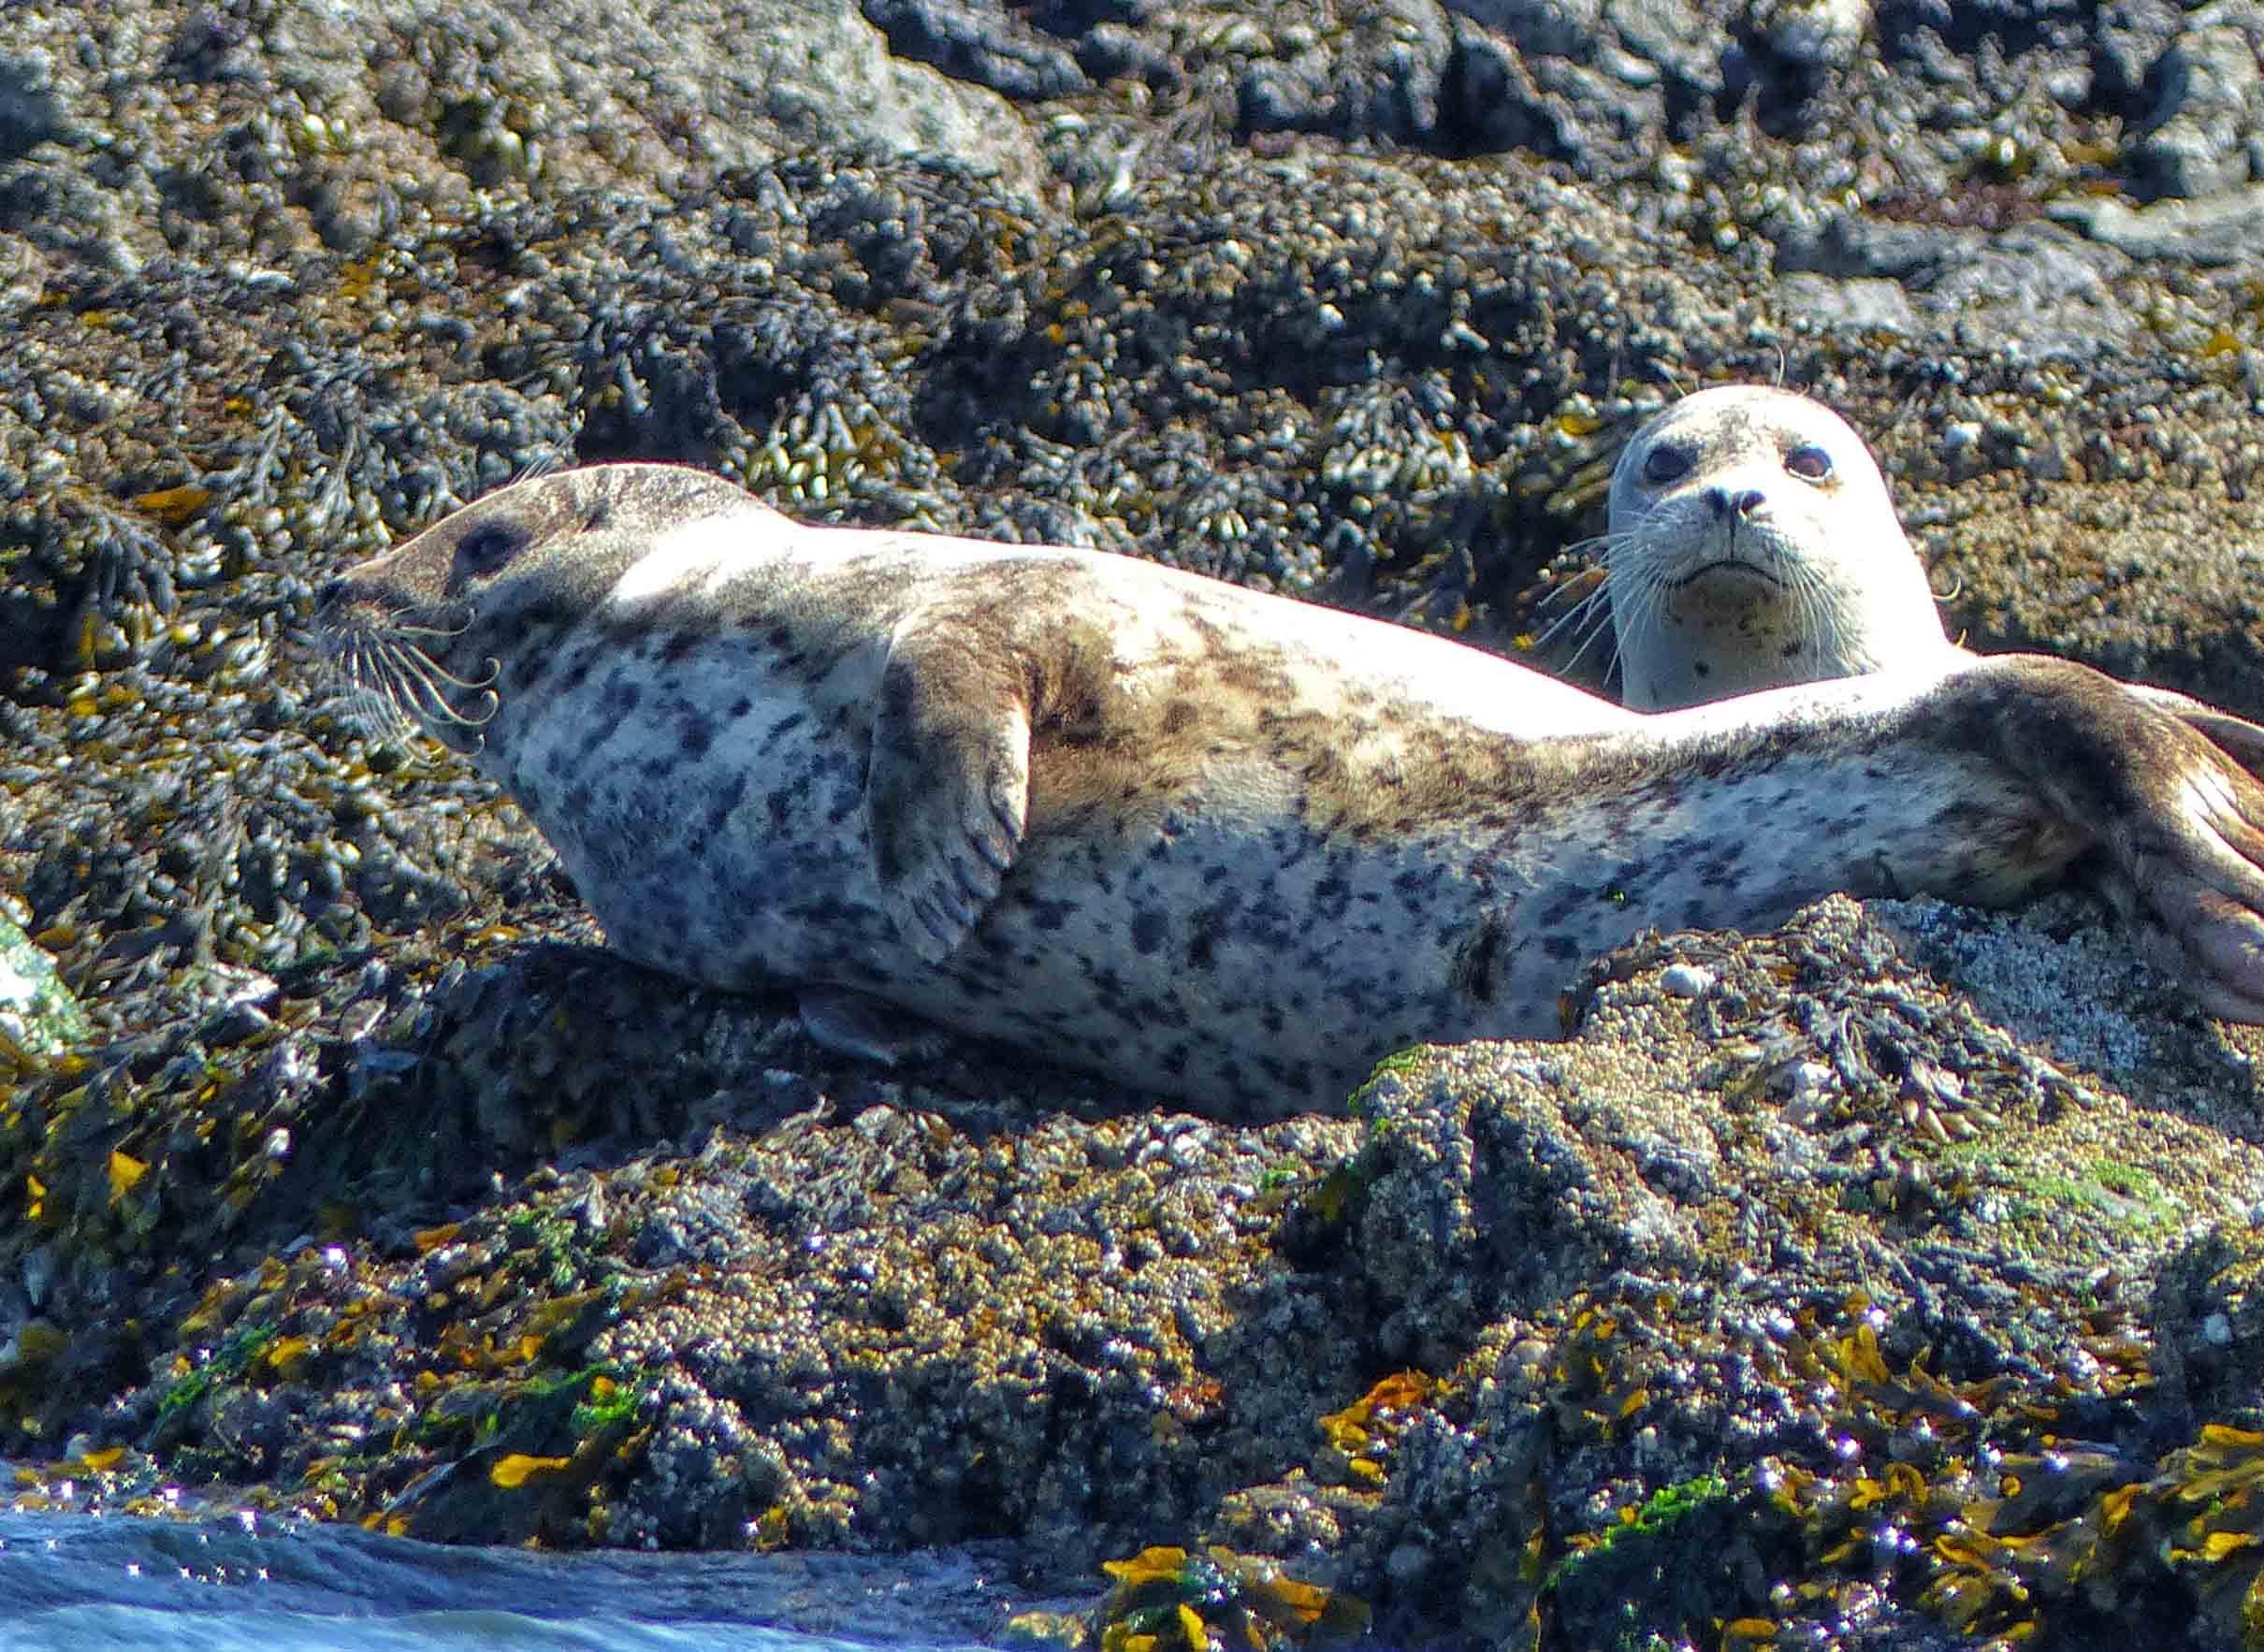 Two seals on rocks